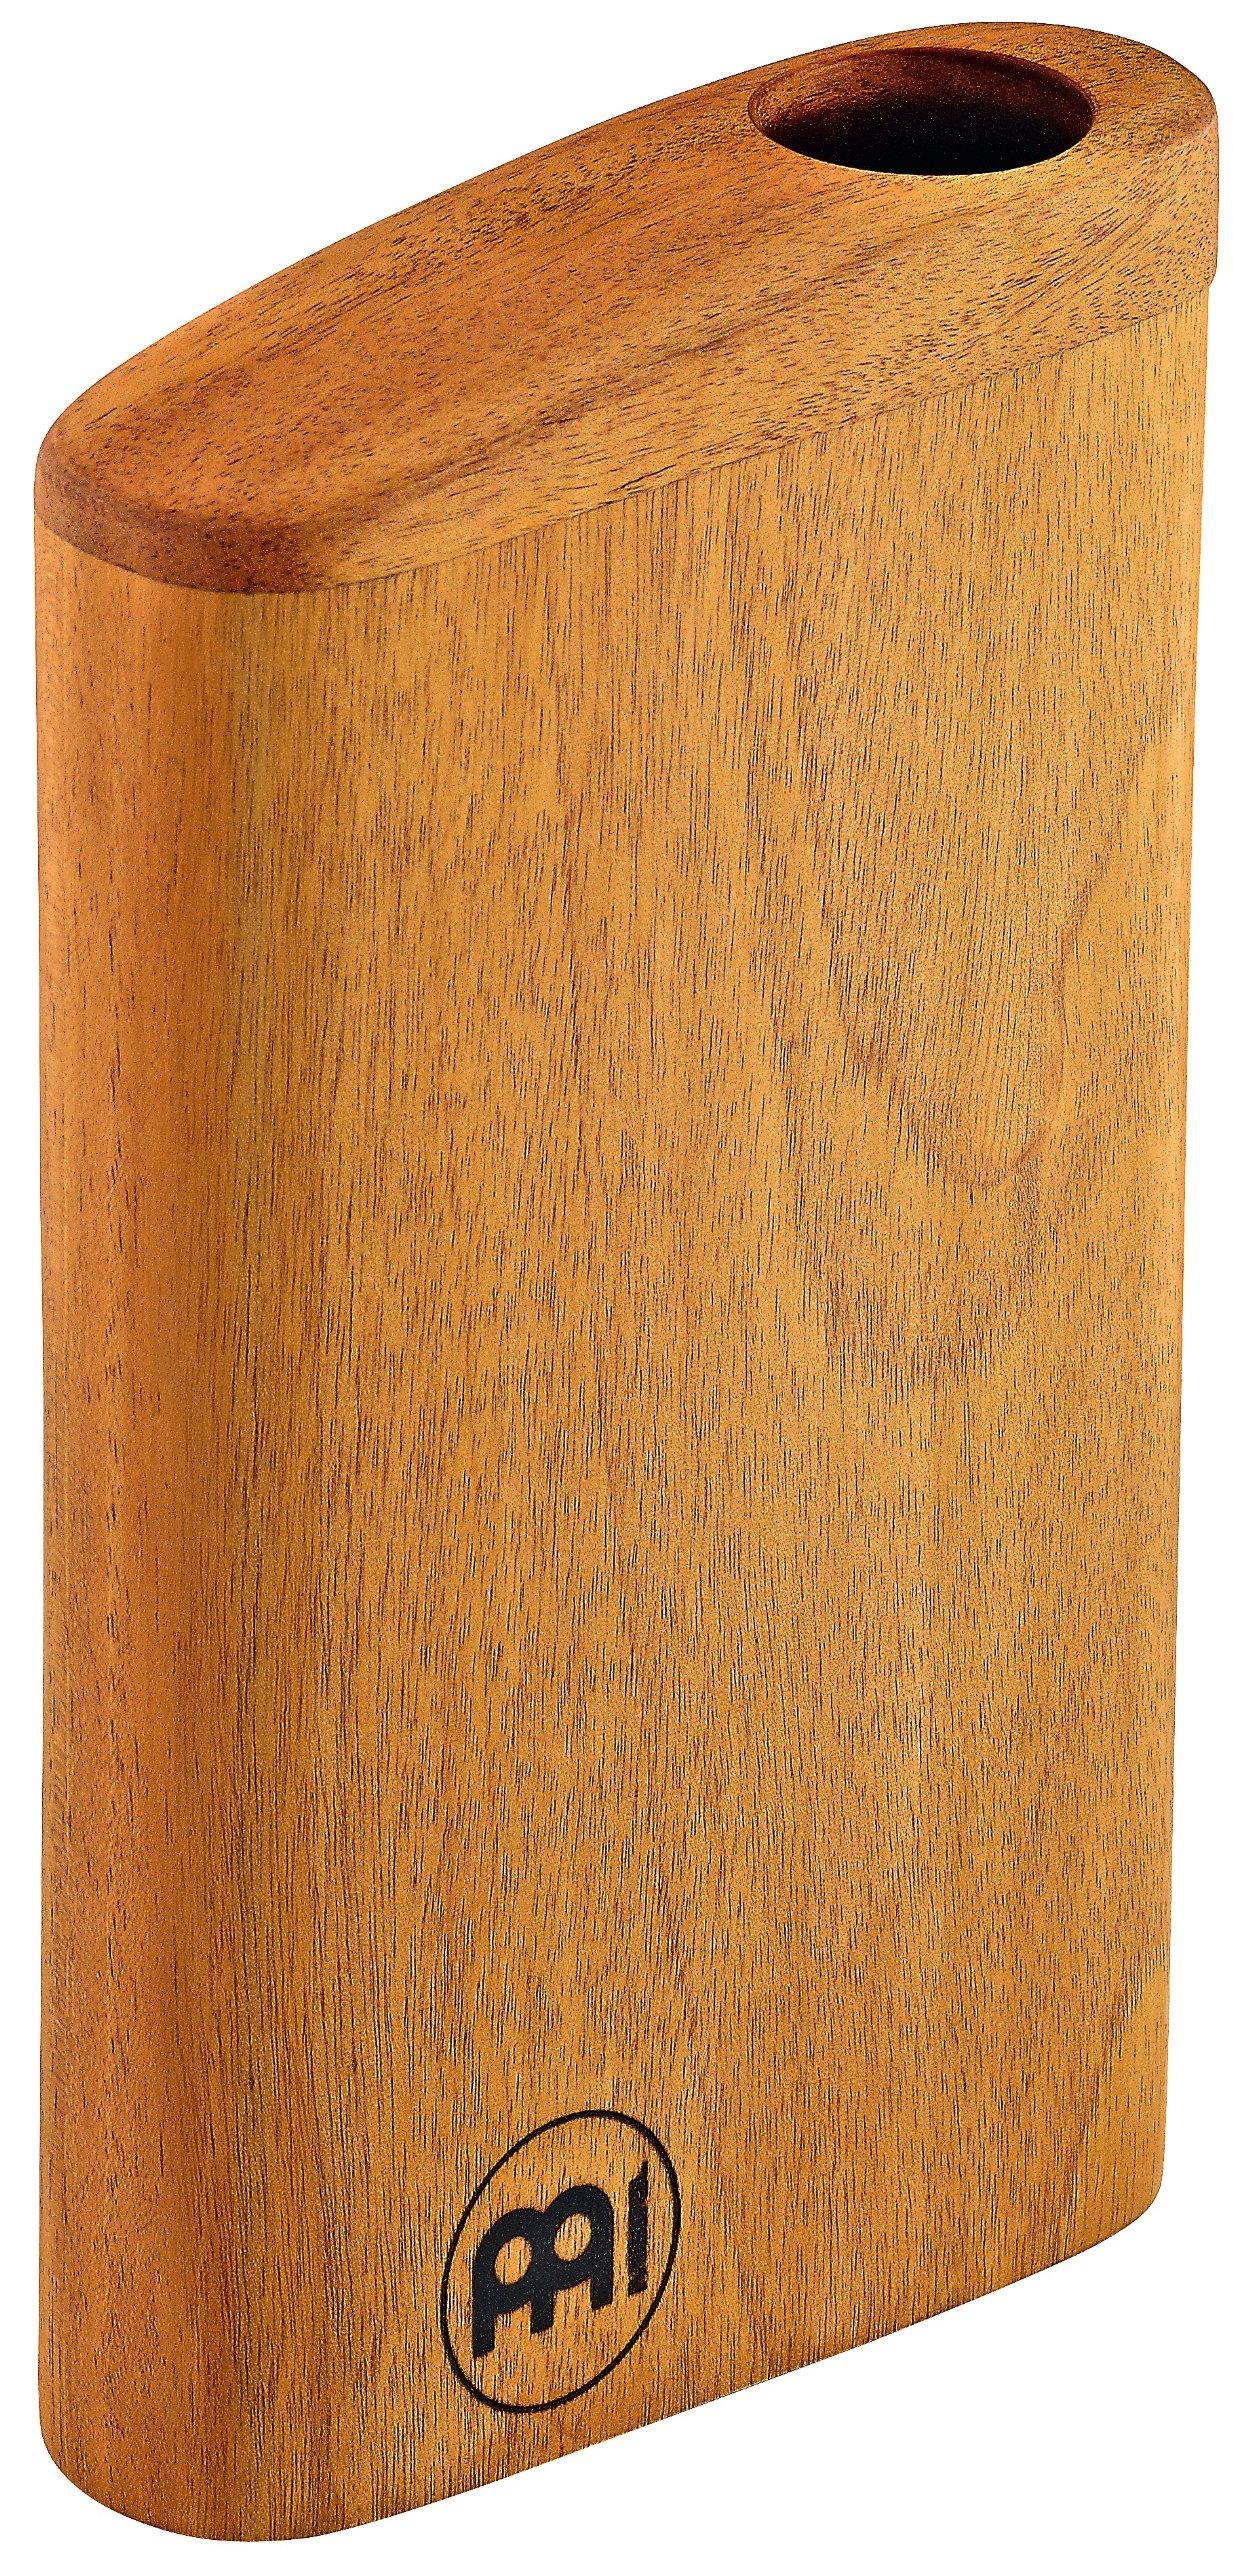 Meinl Percussion DDG-BOX Compact Travel Didgeridoo, Mahogany (8 1/2'' x 5'')